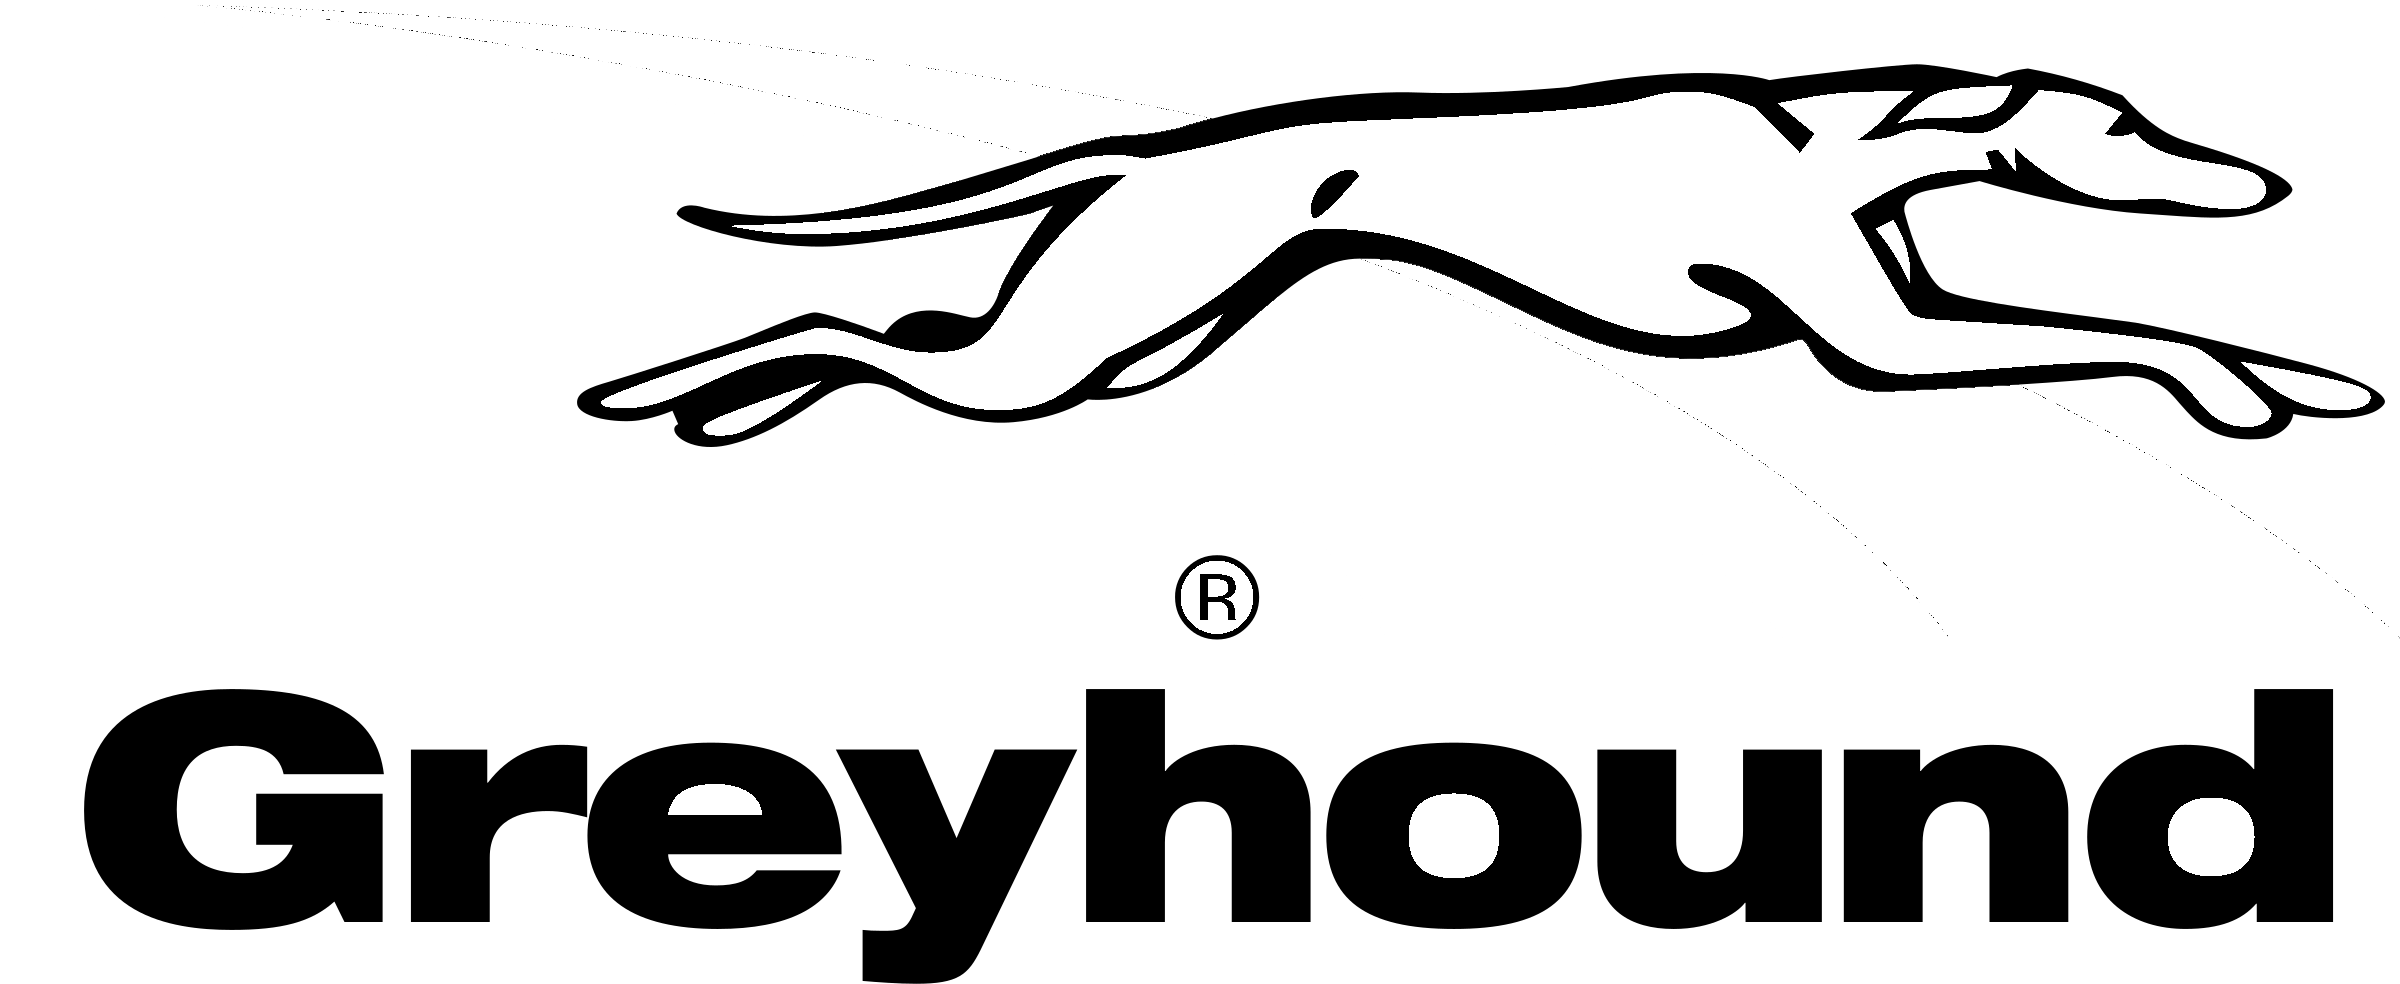 greyhound-logo-black-and-white.png